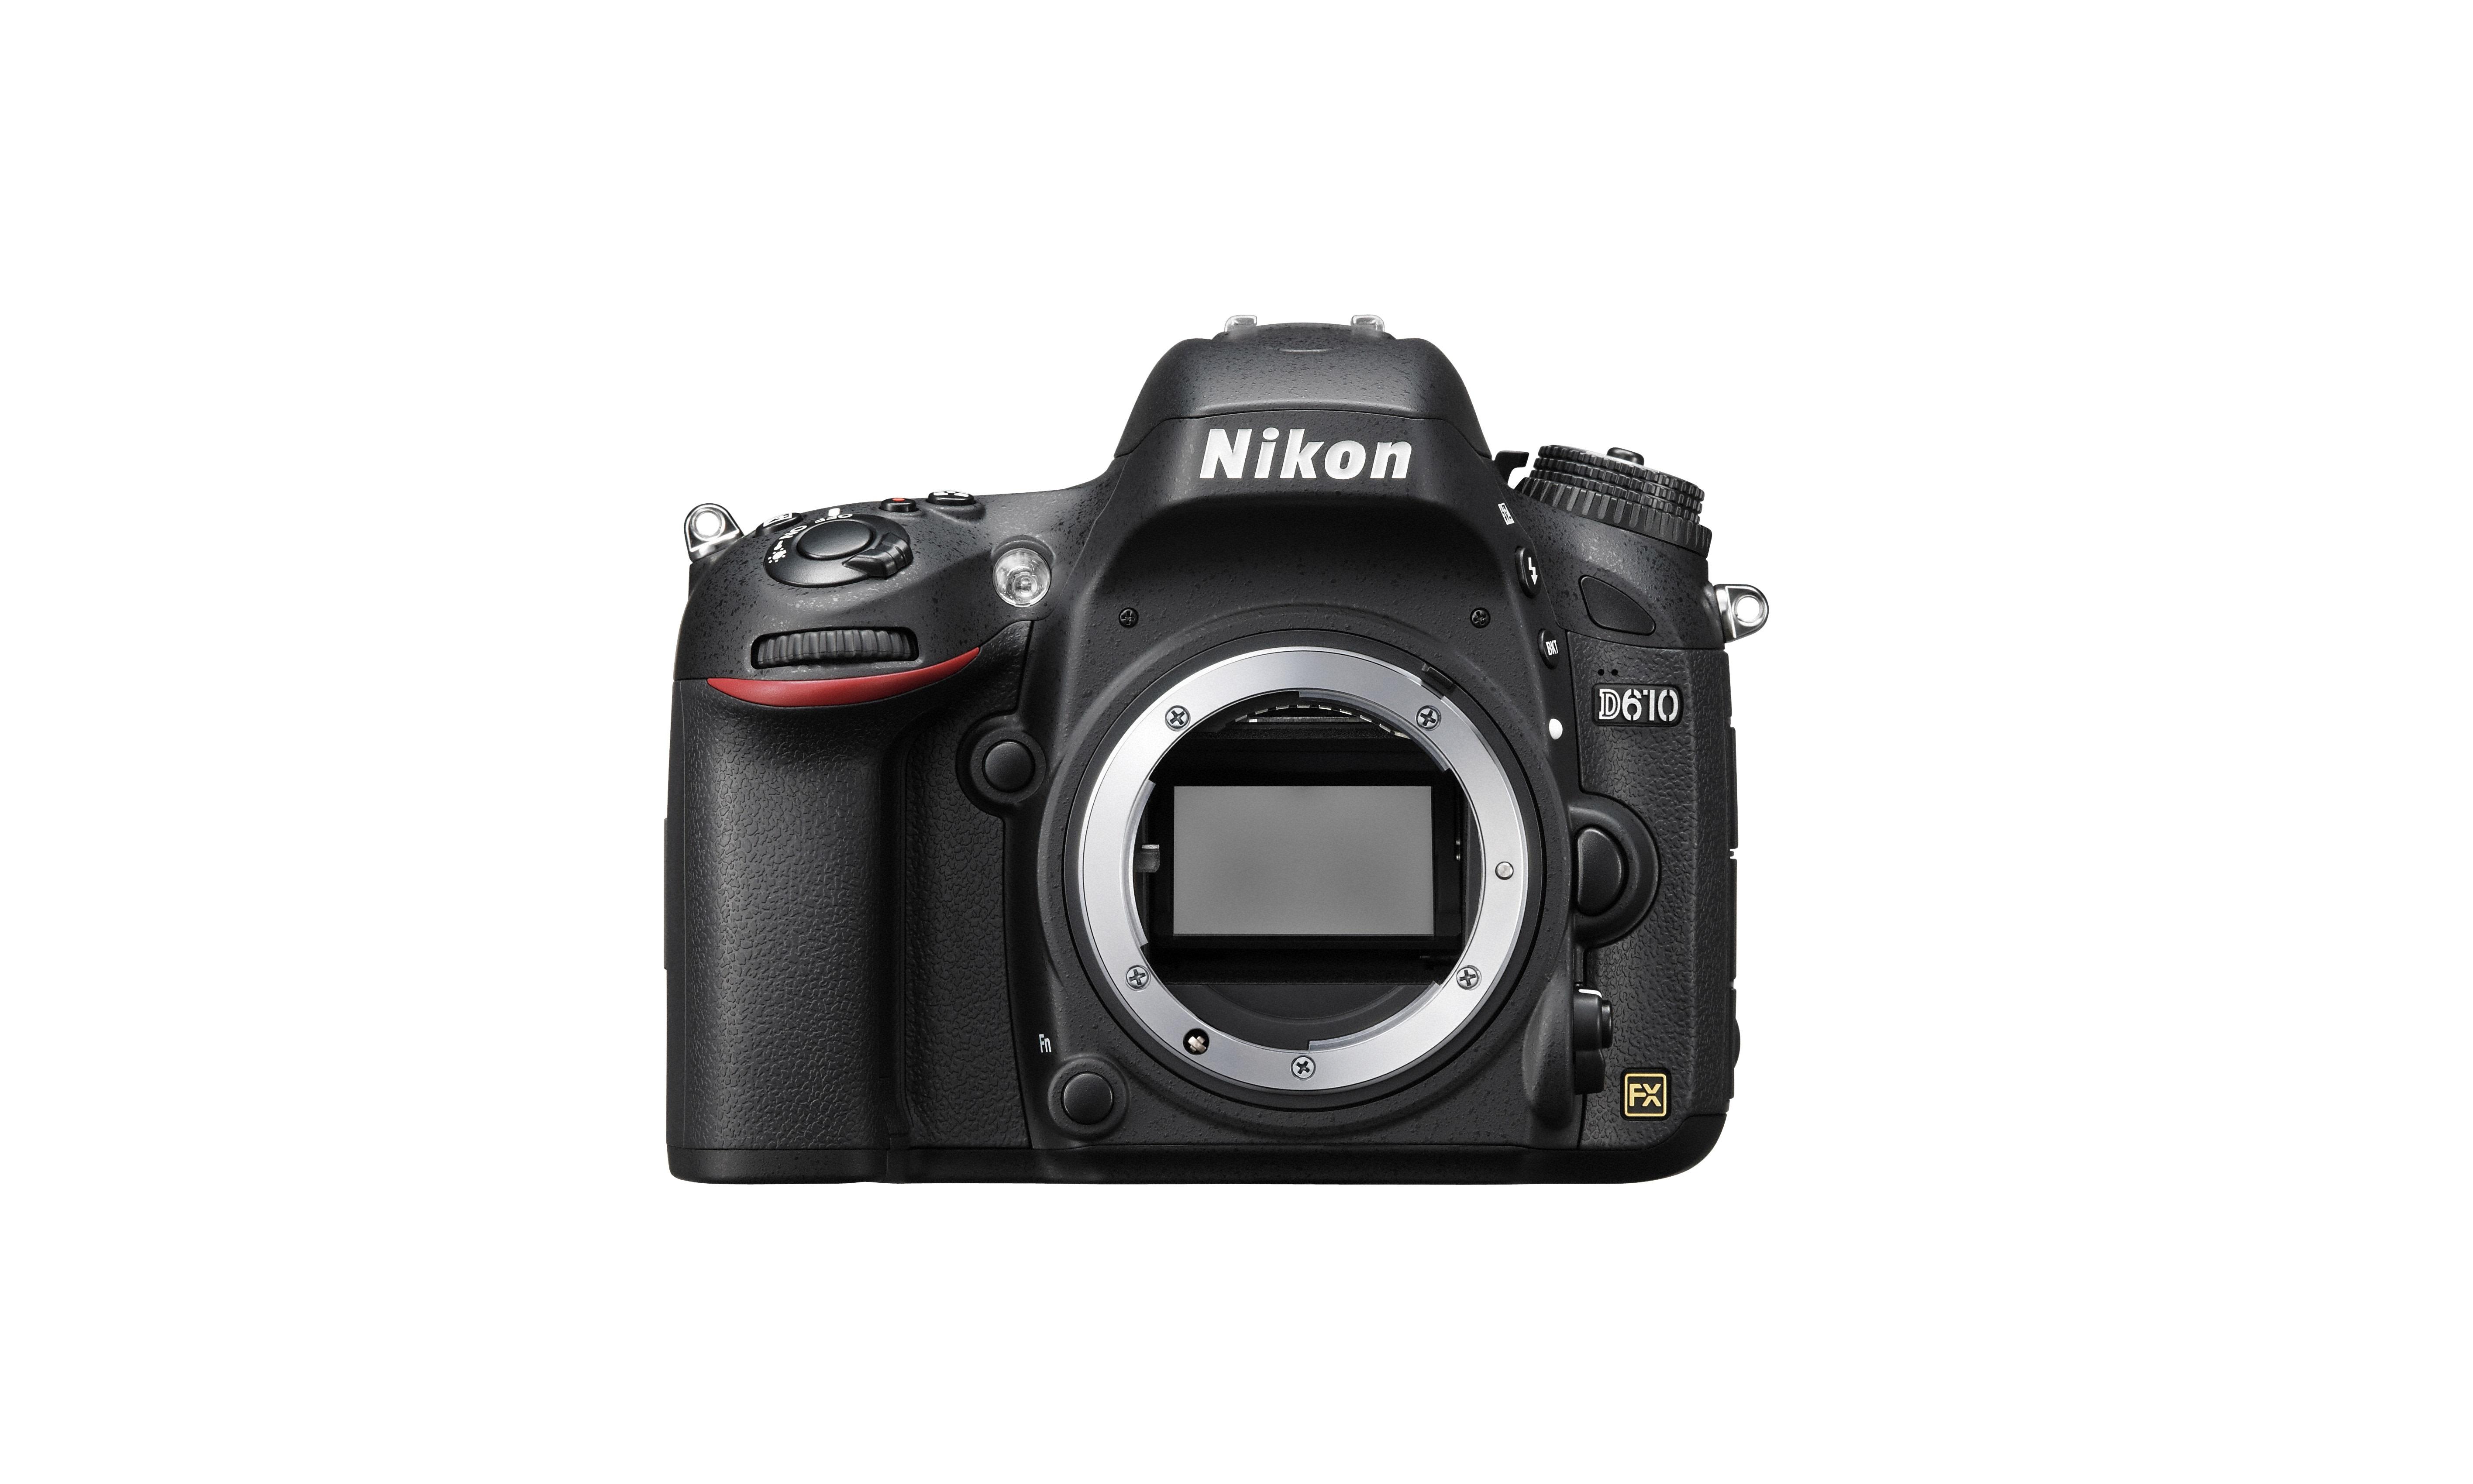 Kamera Nikon D610 возможный комплект Nikon 60mm f/2.8D AF Micro Nikkor